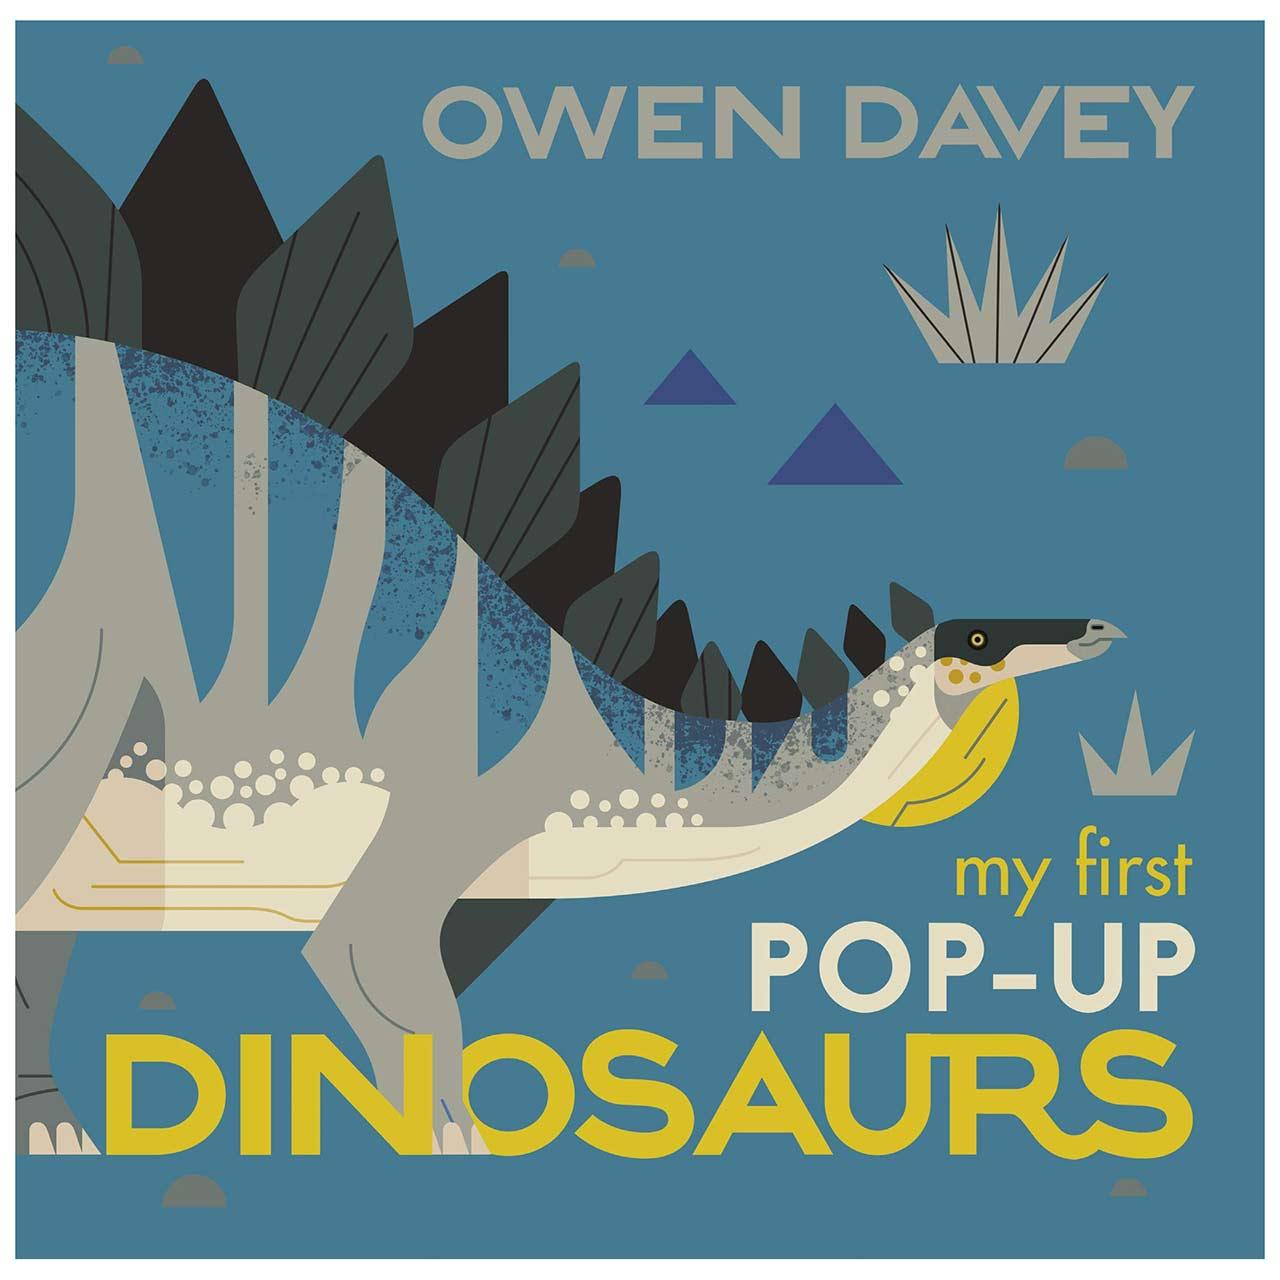 My First Pop-Up Dinosaurs Book by Owen Davey | the design gift shop